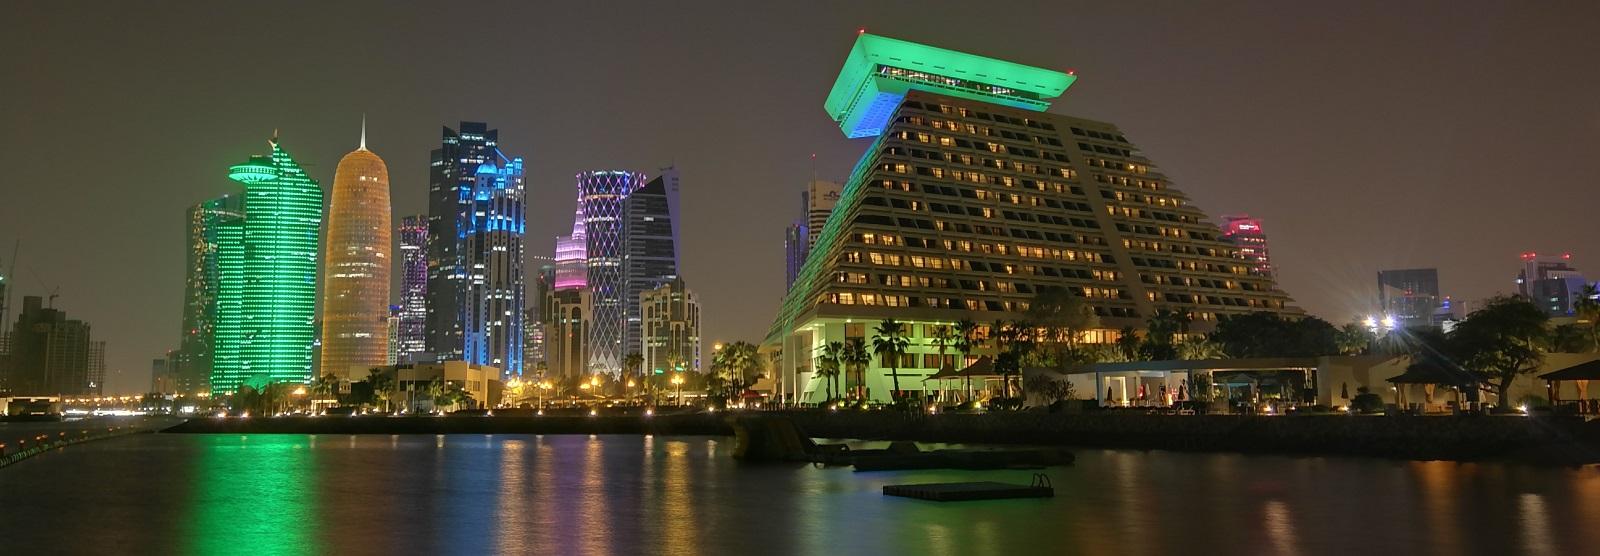 Doha, Qatar (Photo: Nikolovskii/Flickr)